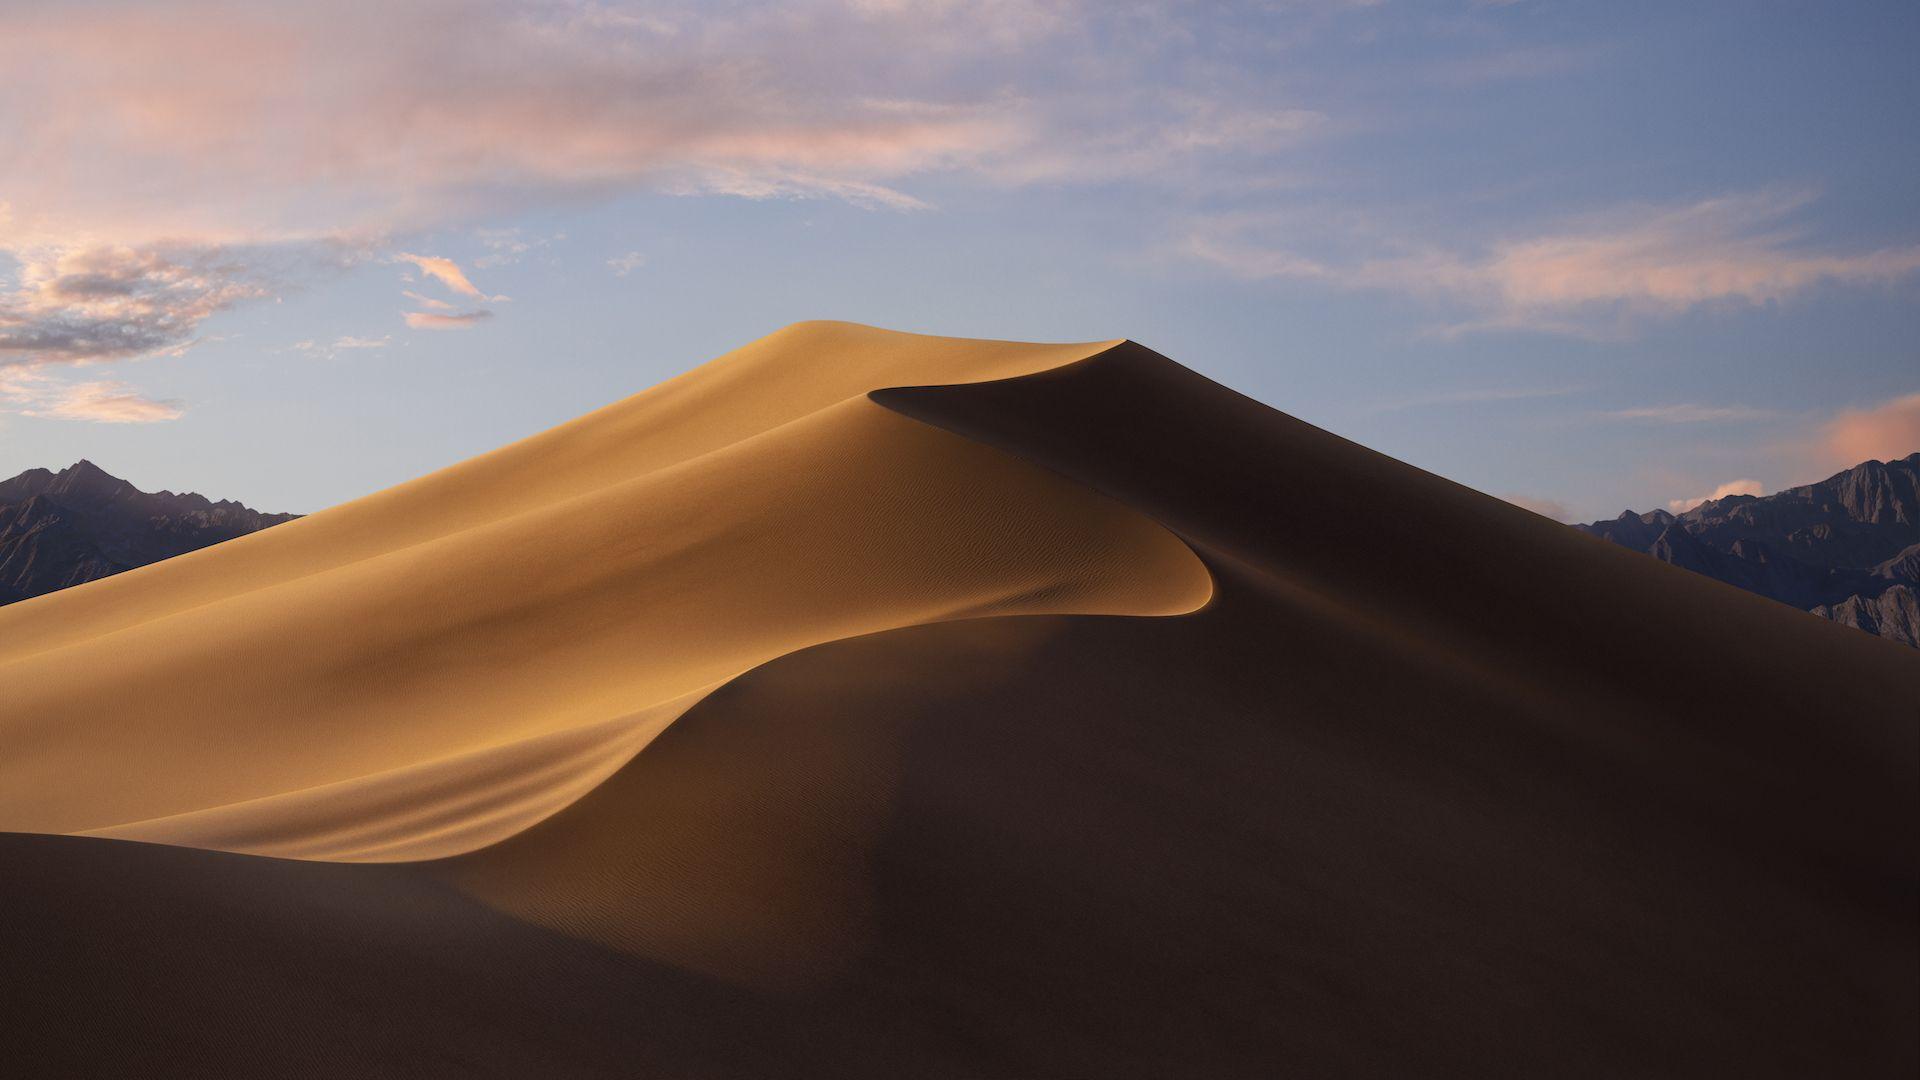 Download Macos Mojave Wallpapers Oboi Oboi Dlya Telefona